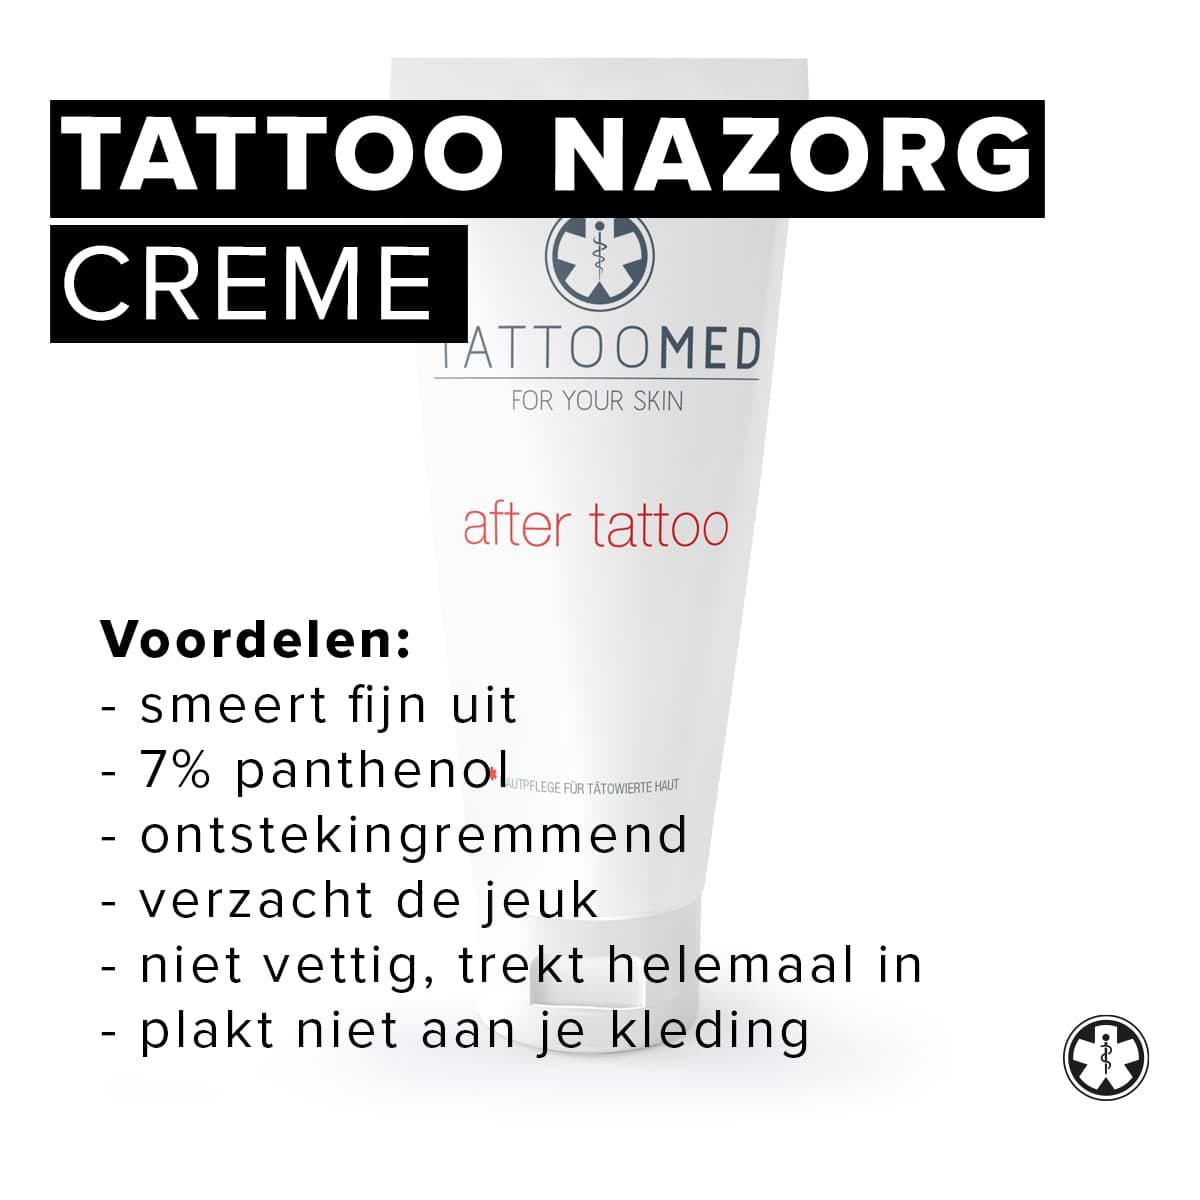 Tattoo nazorg | verzorging